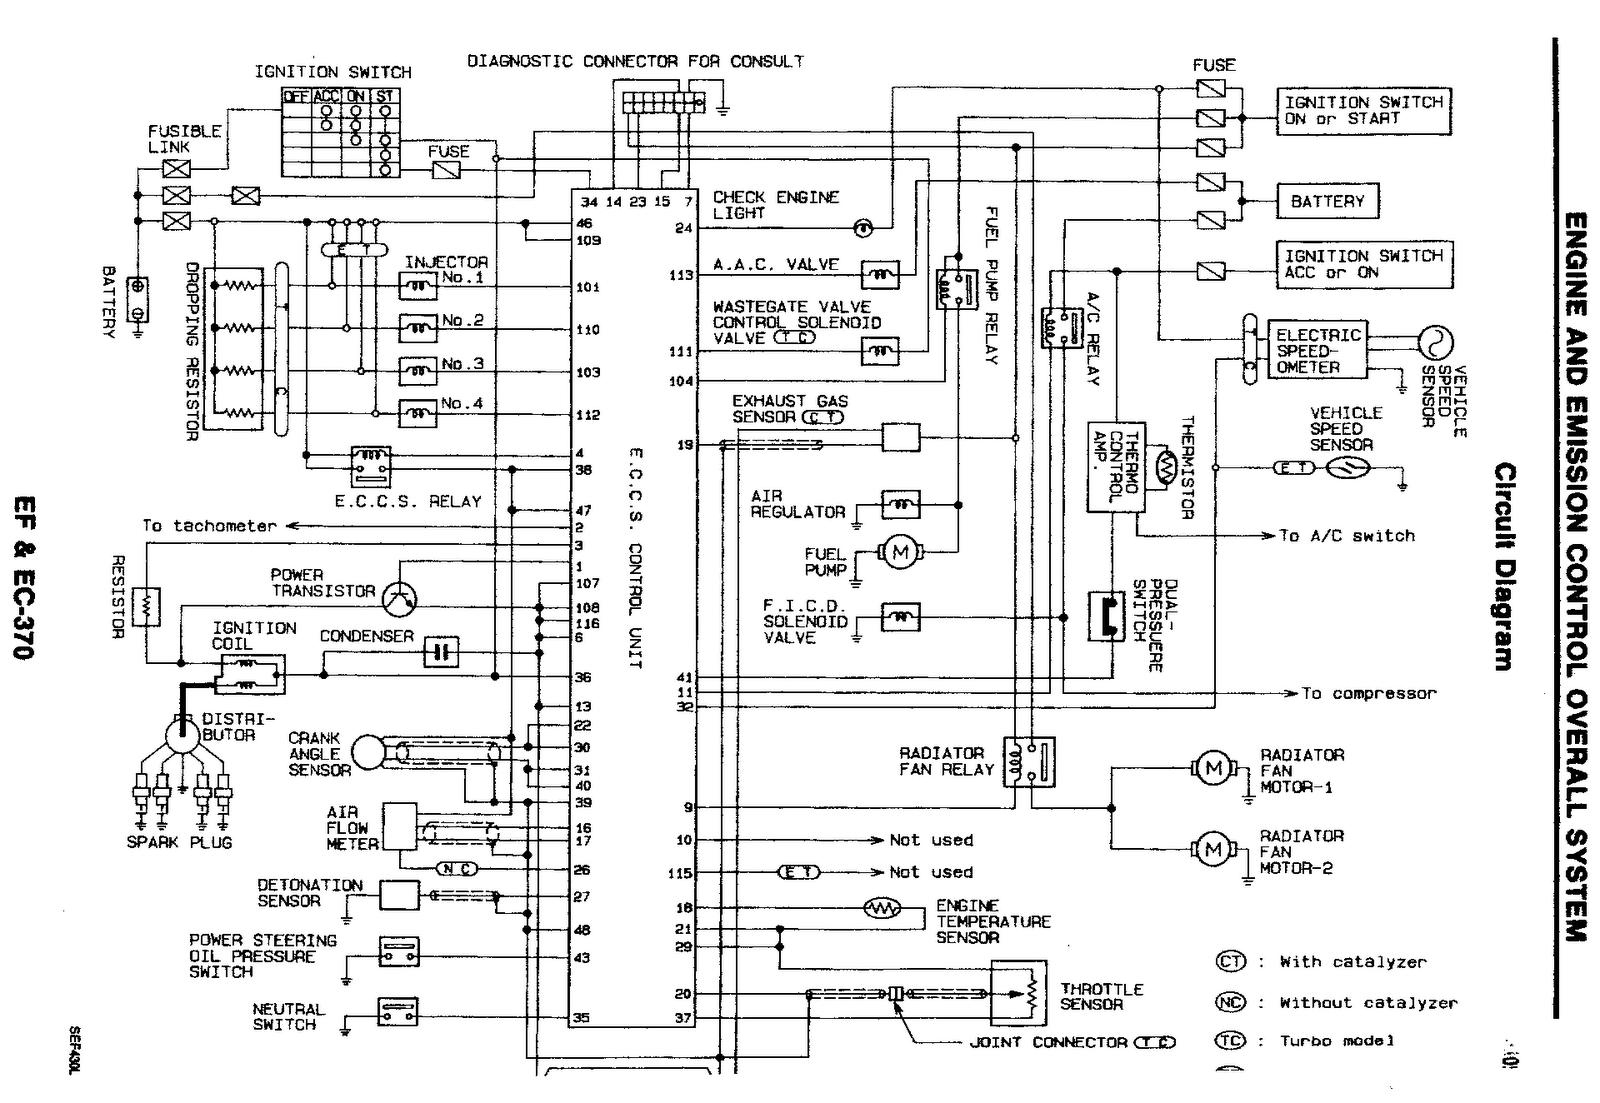 [DIAGRAM_3ER]  KR_1703] 1999 Mitsubishi Eclipse Engine Diagram Wiring Diagram | 1999 Mitsubishi Eclipse Engine Wiring Diagram |  | Greas Garna Mohammedshrine Librar Wiring 101